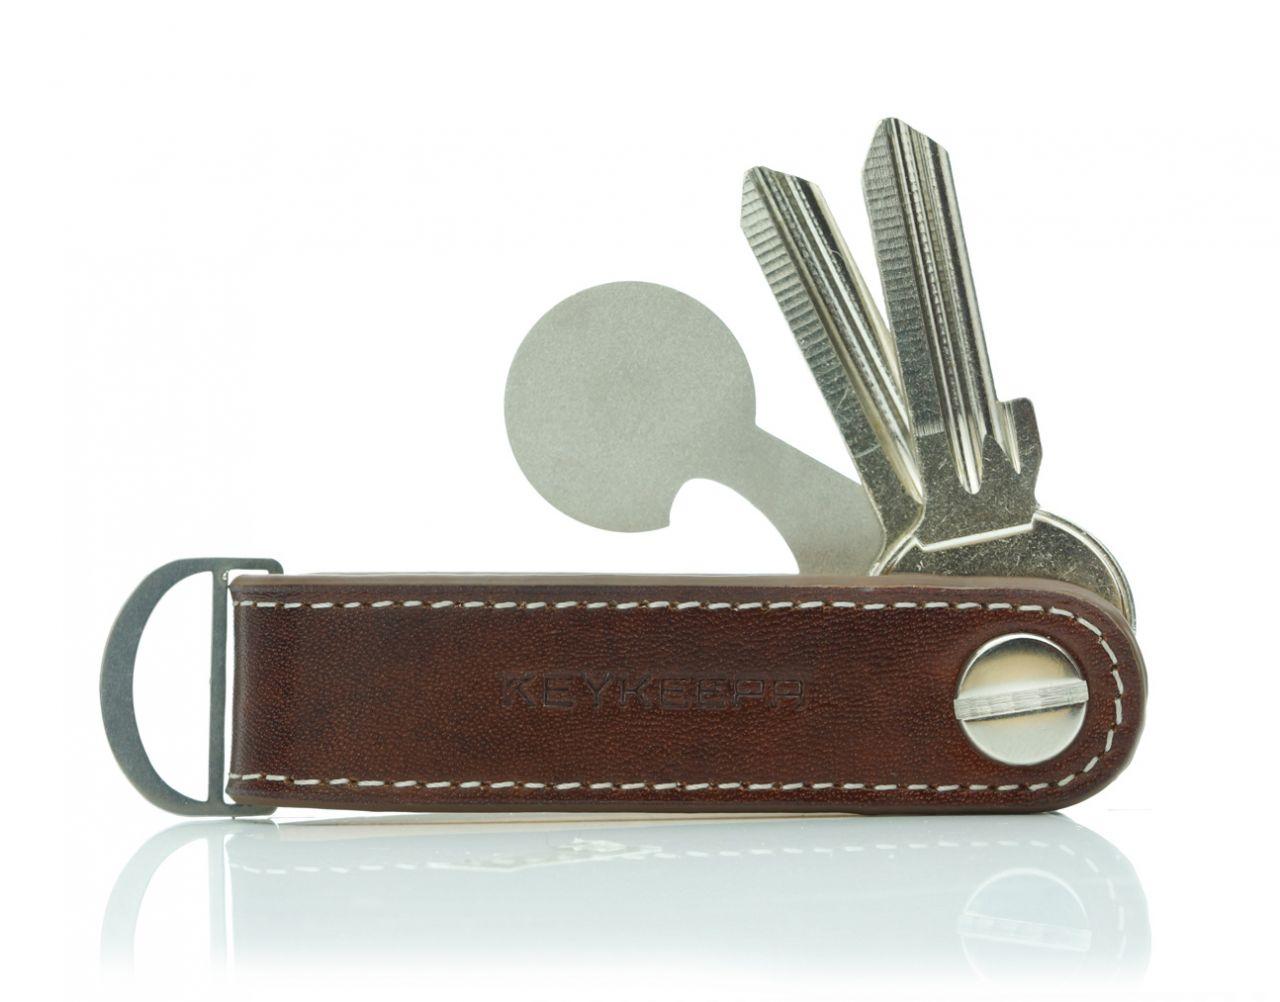 Keykeepa Schlüsselorganizer Leder Loop - Mocca Brown